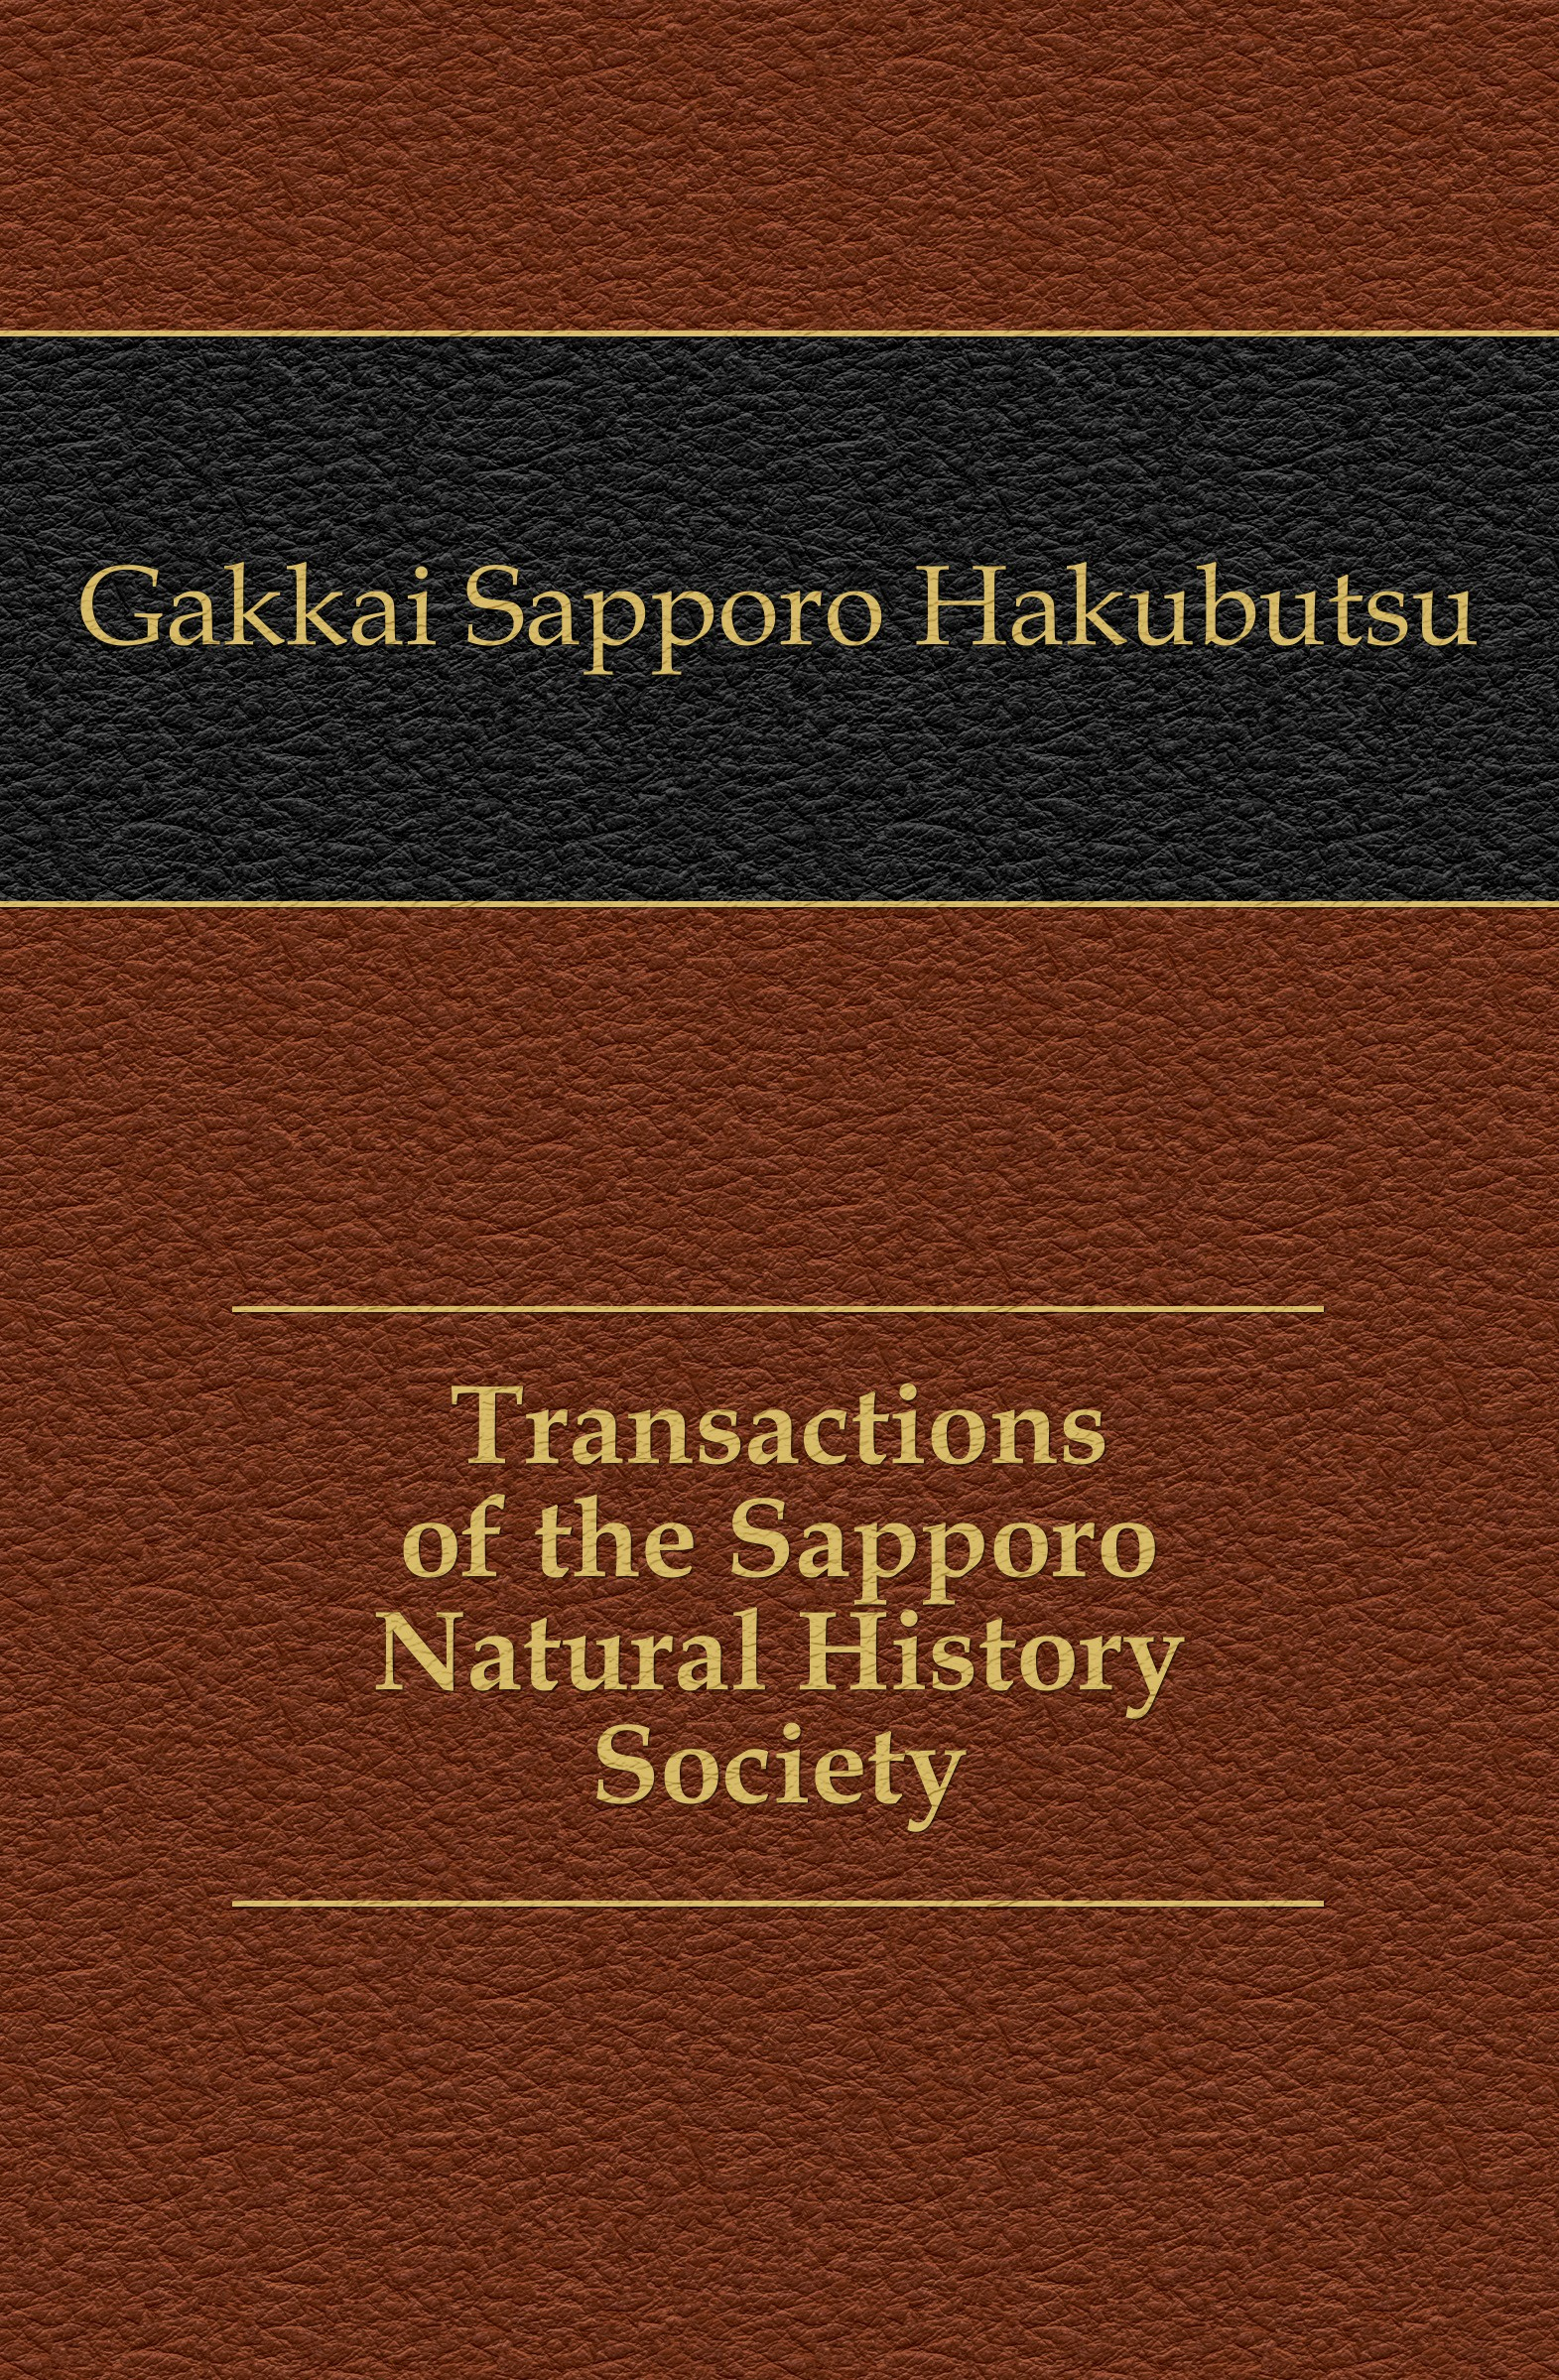 Gakkai Sapporo Hakubutsu Transactions of the Sapporo Natural History Society недорго, оригинальная цена